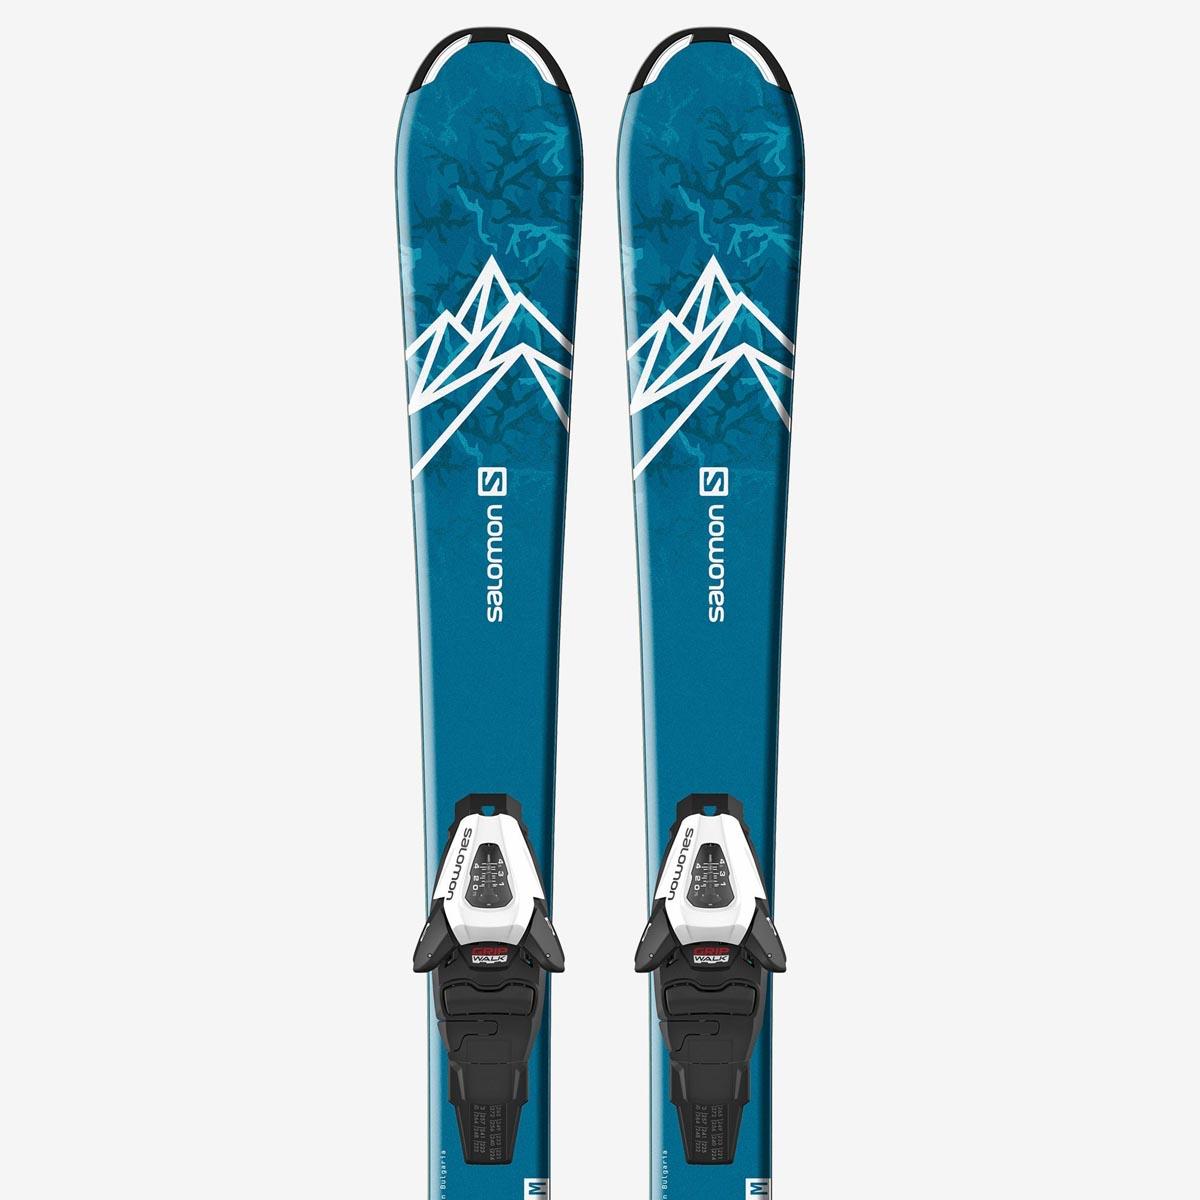 Комплект: лыжи + крепления QST MAX Jr S + C5 GW J75